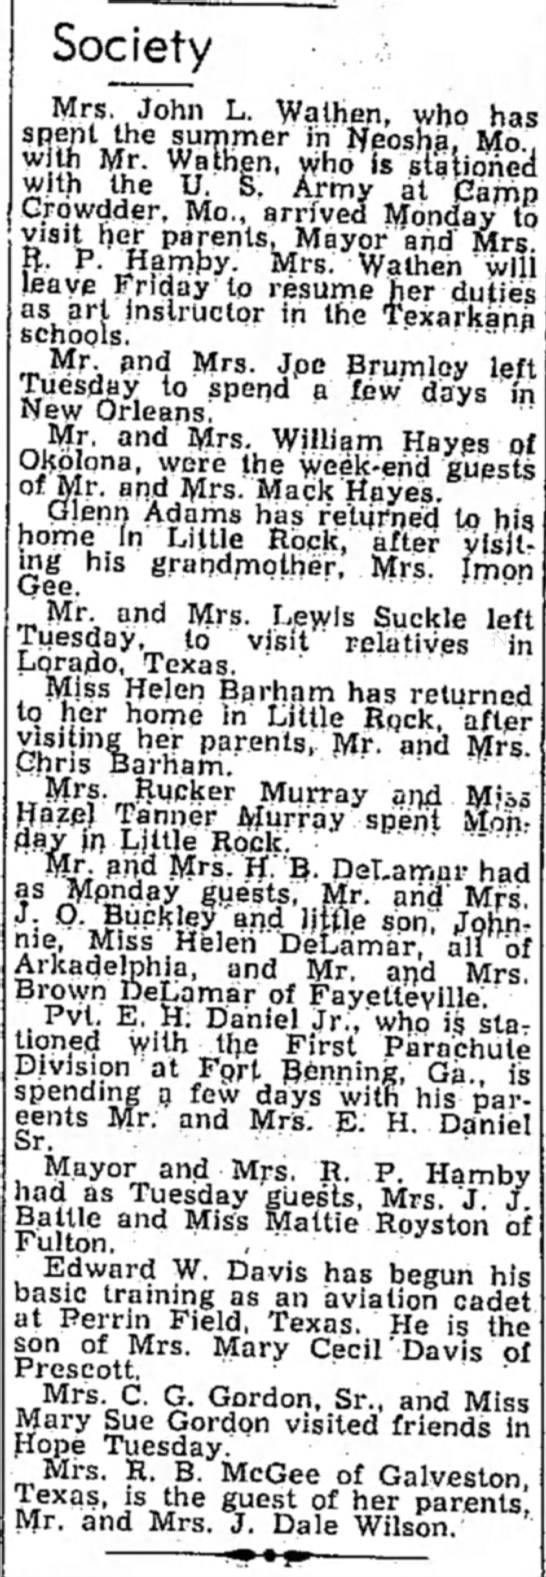 E. H. Daniel Hope Star 2 Sep 1942 - Society Mrs. John L. Wathen, who has s ^ff^i he...